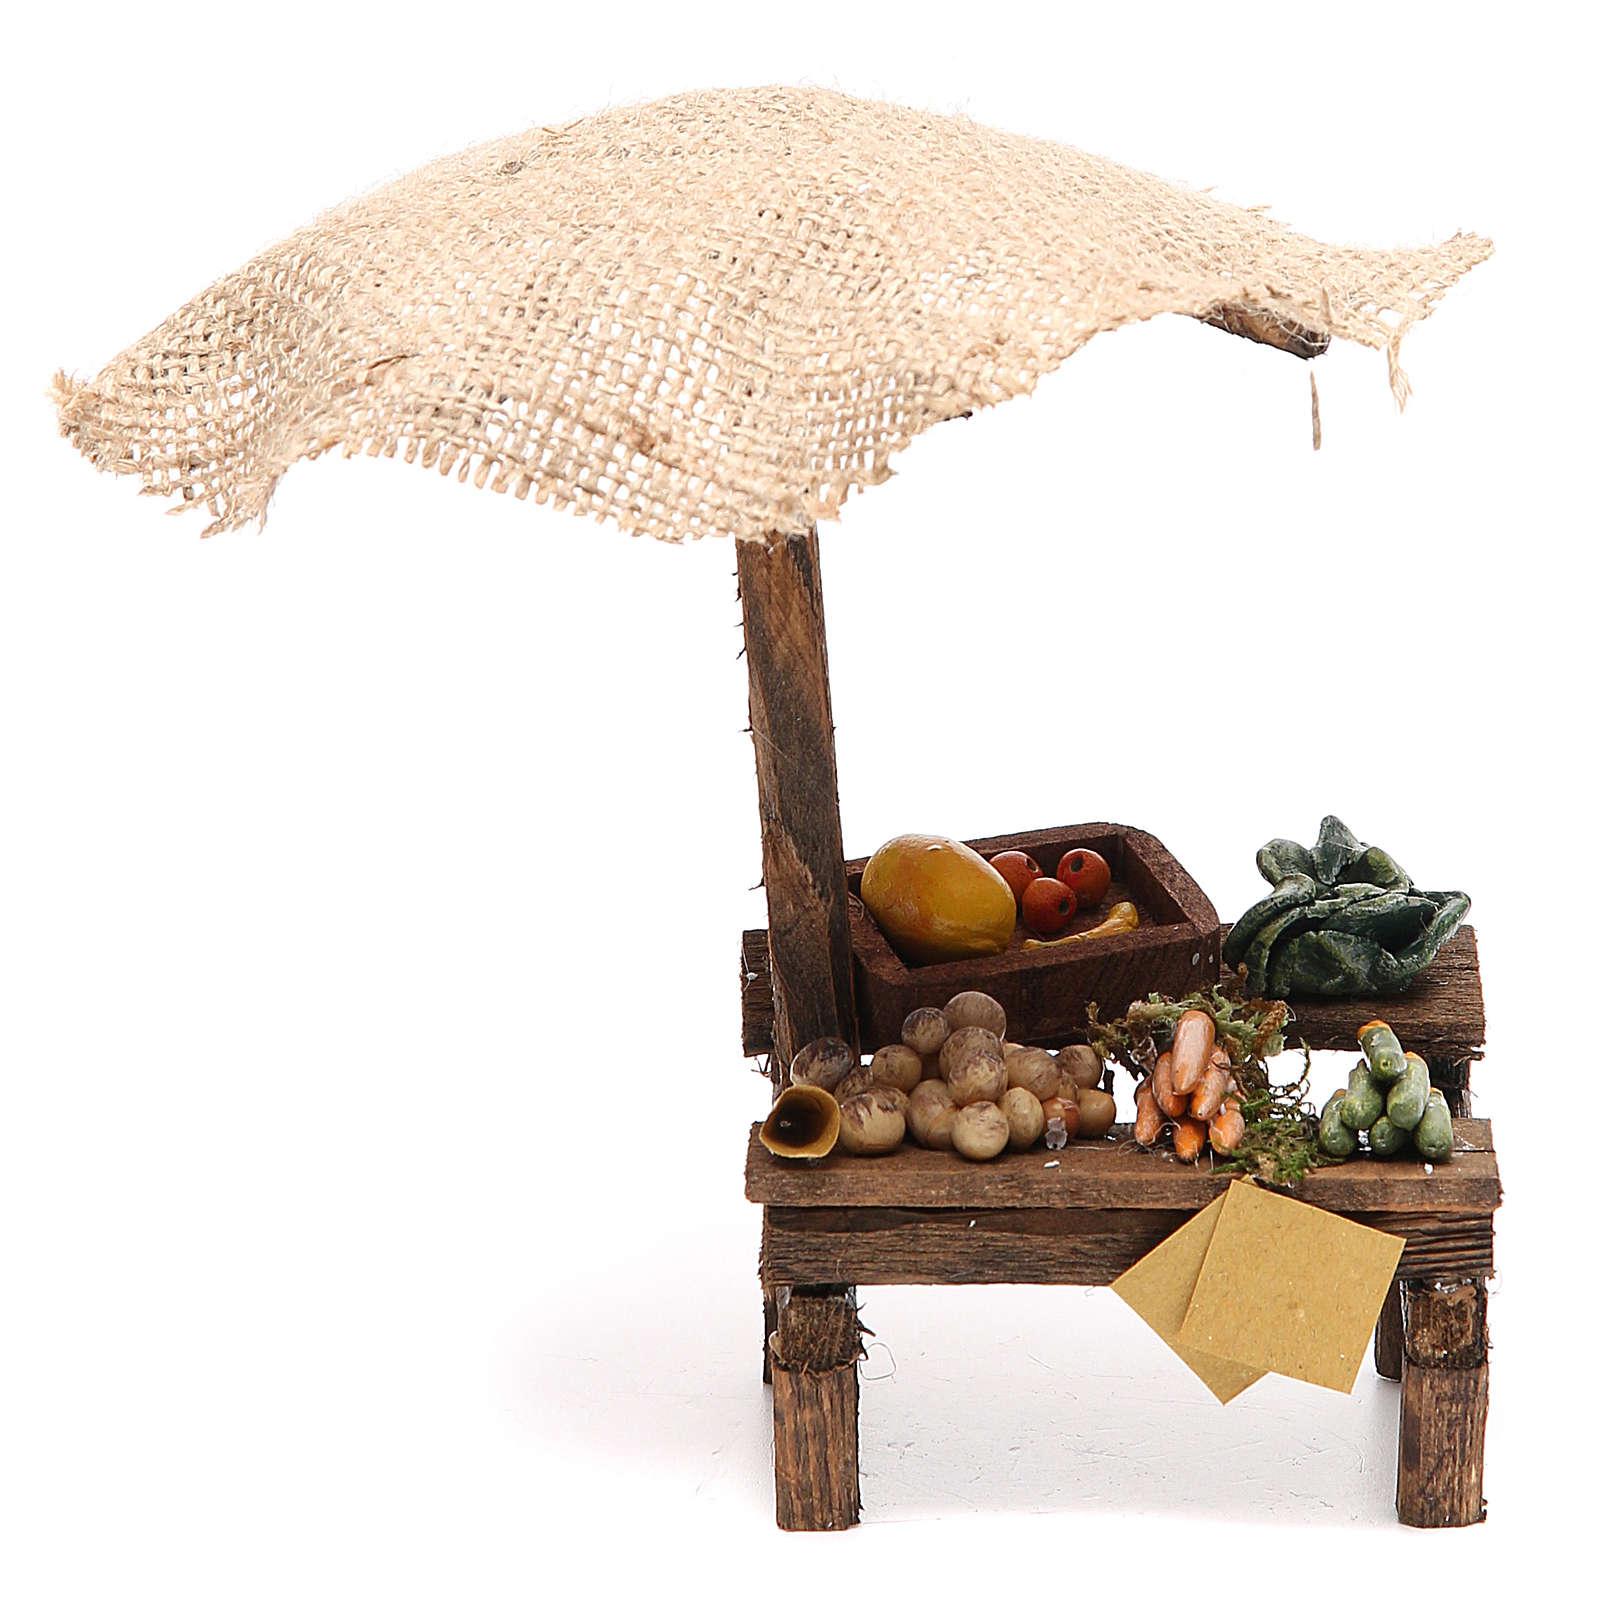 Banchetto ombrello verdure 16x10x12 presepe 12 cm 4